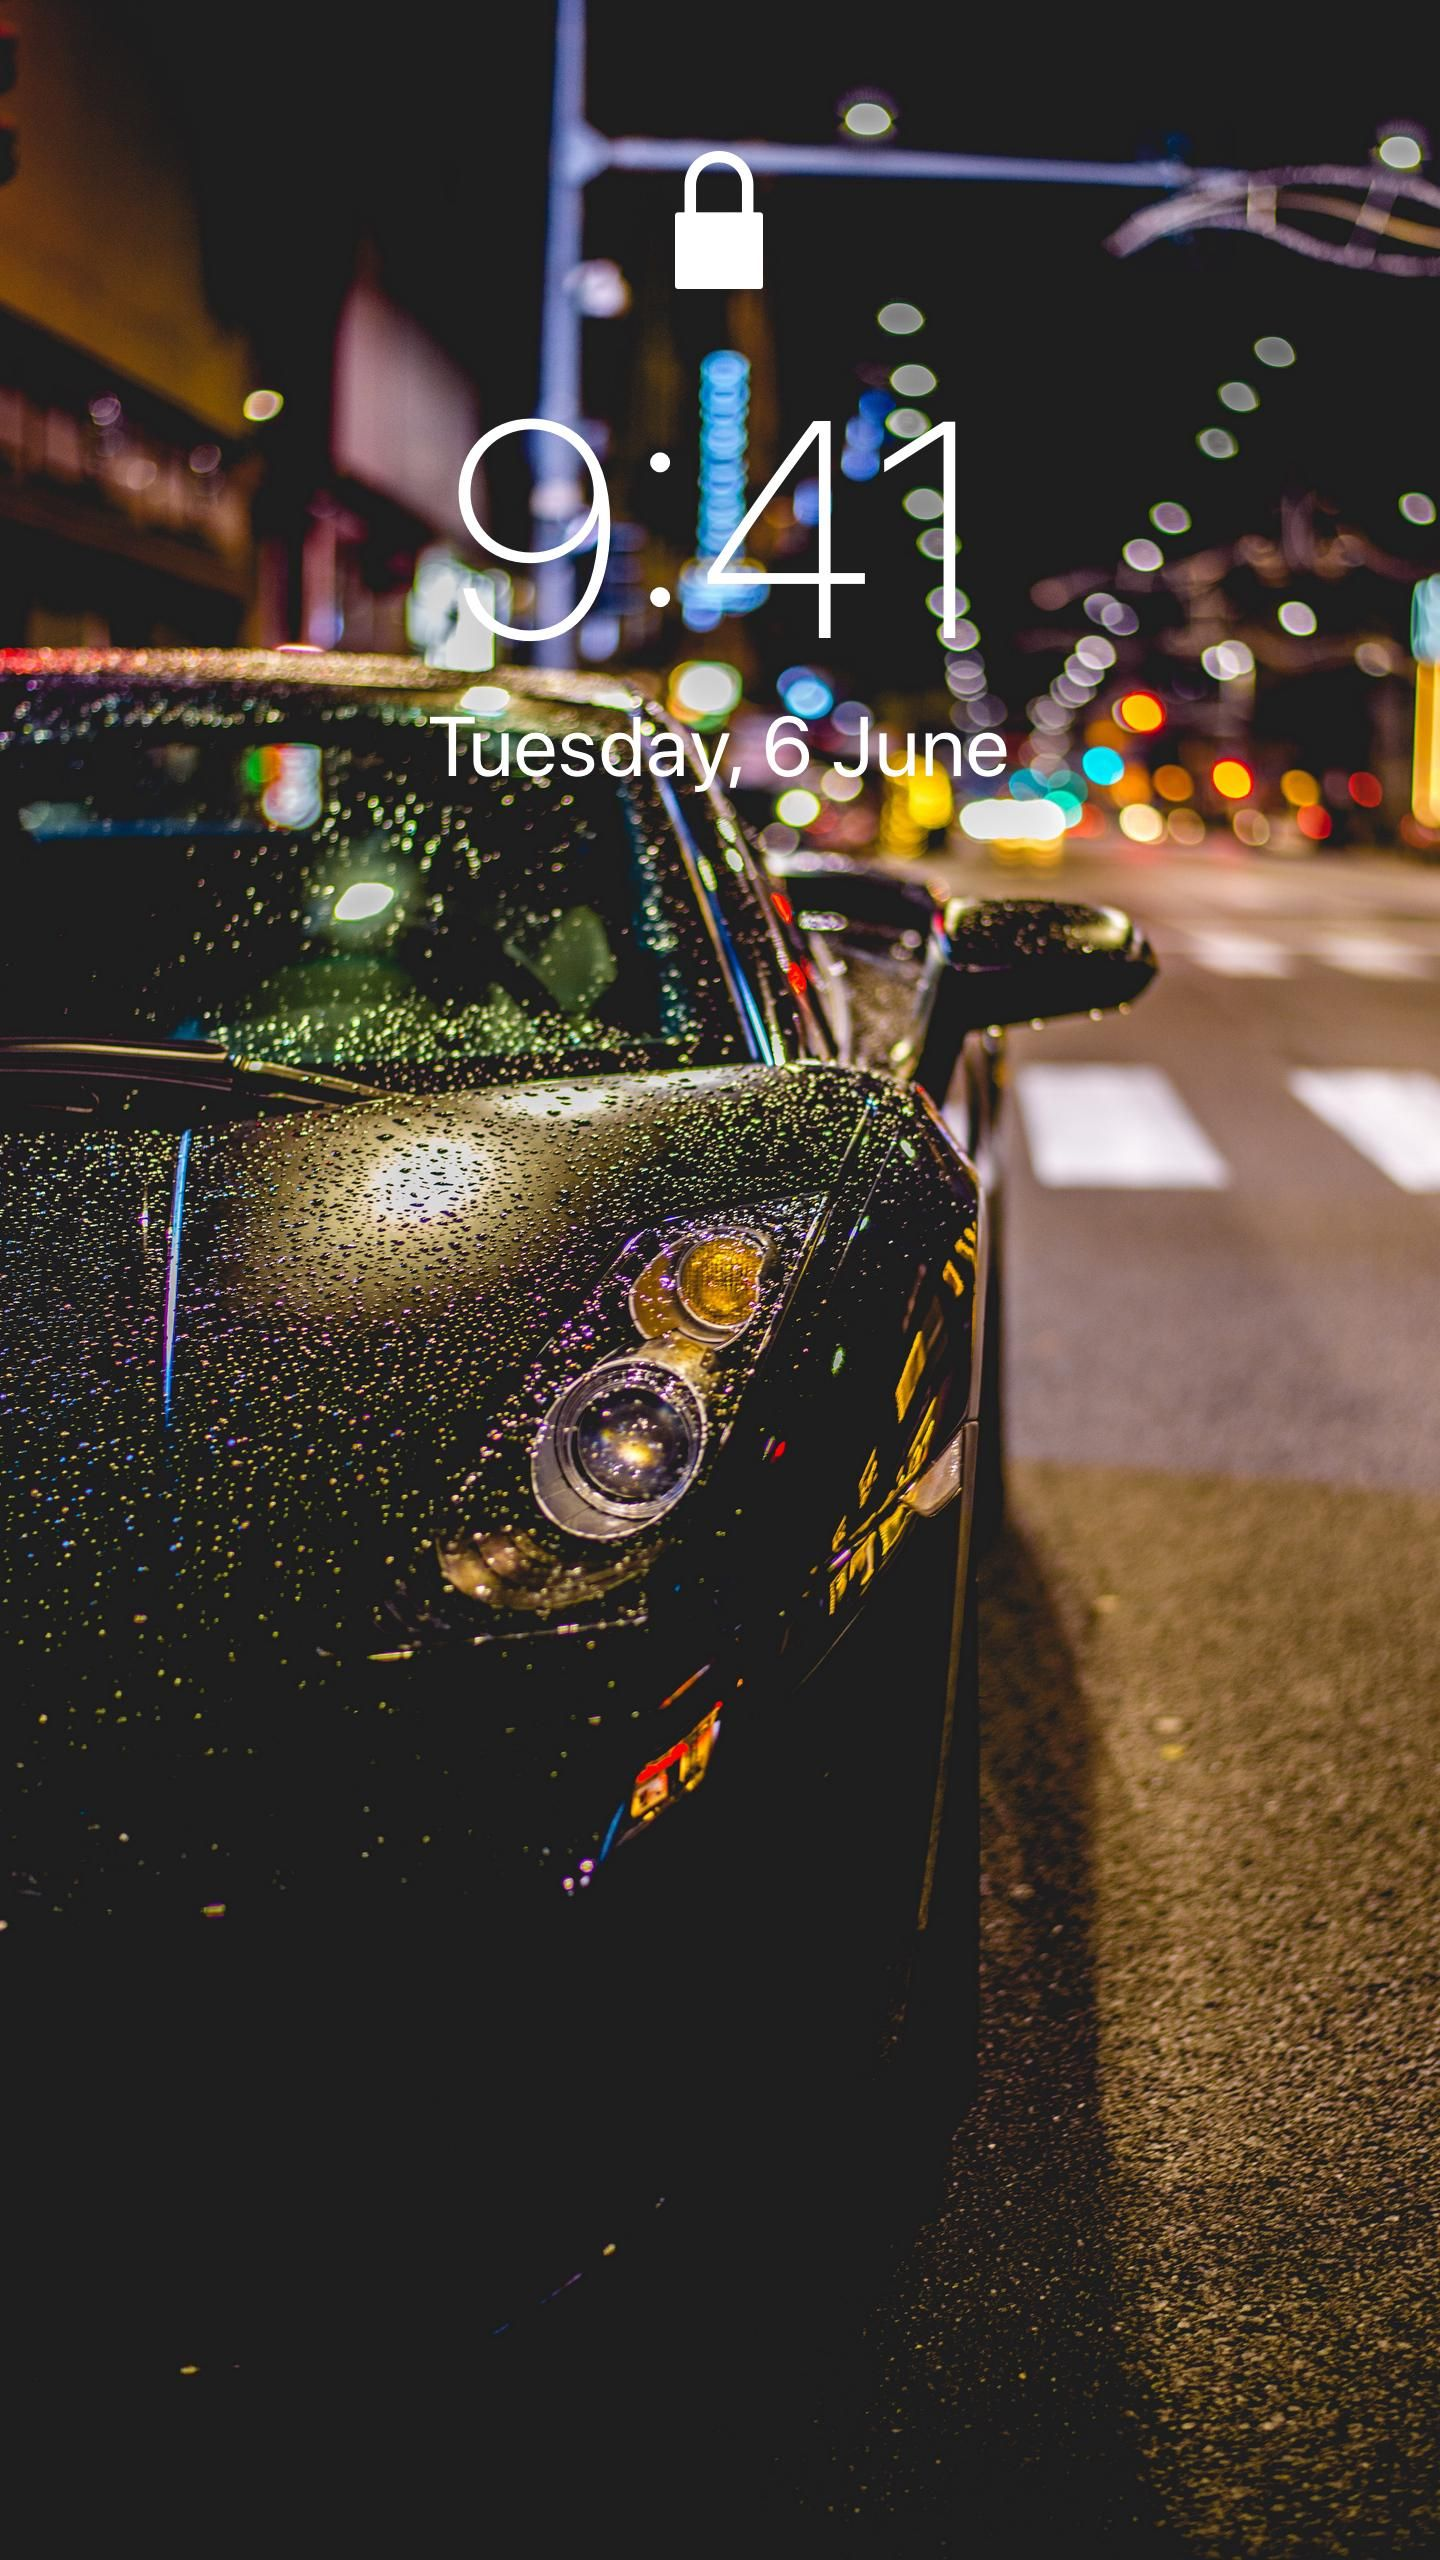 Auto Front View Rain Drops Car Background Wallpaper Hd Iphone Ipad Car Iphone Wallpaper Best Wallpapers Android Lamborghini Classic